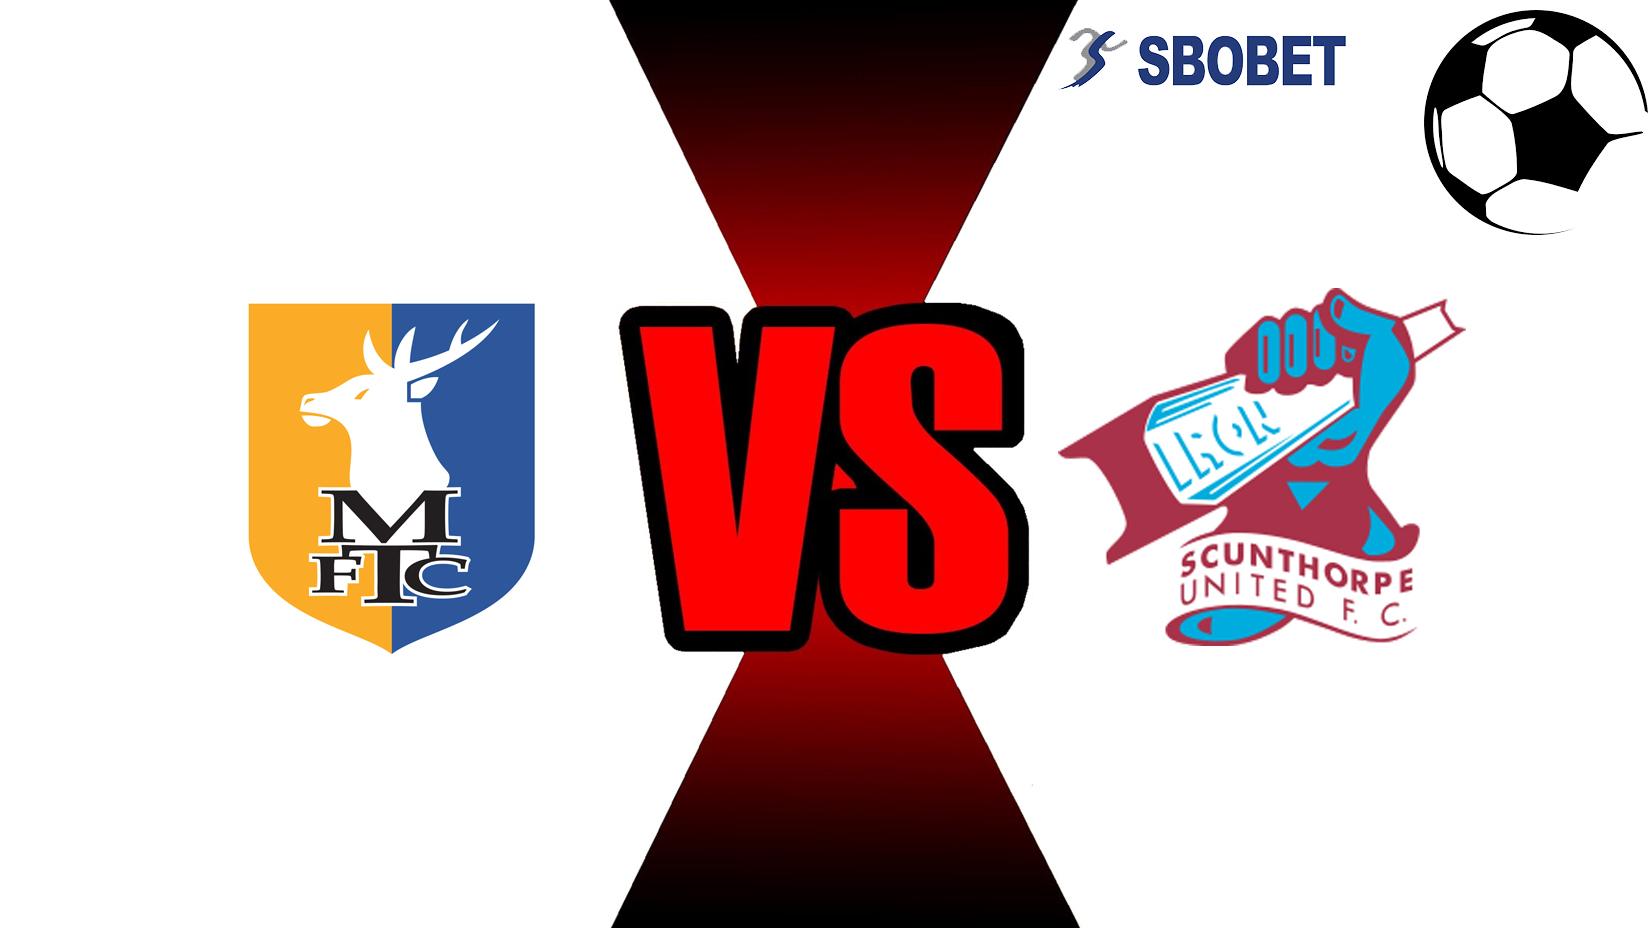 Prediksi Skor Bola Online Mansfield Town Vs Scunthorpe United 14 November 2018